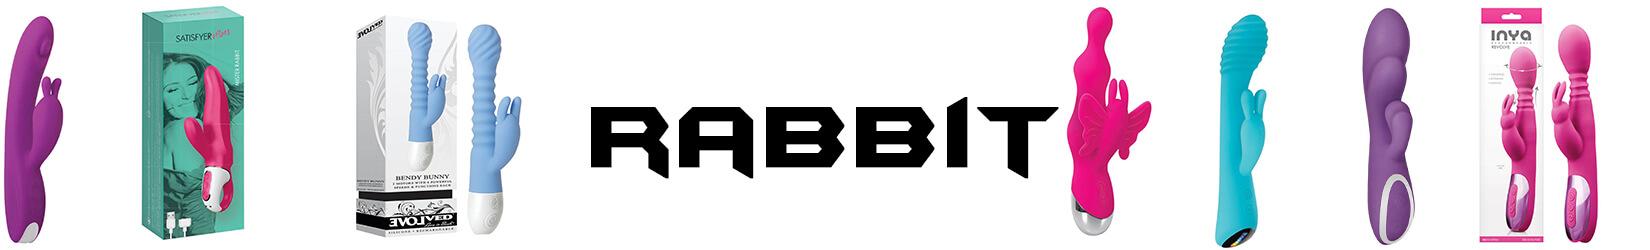 rabbit vibrators